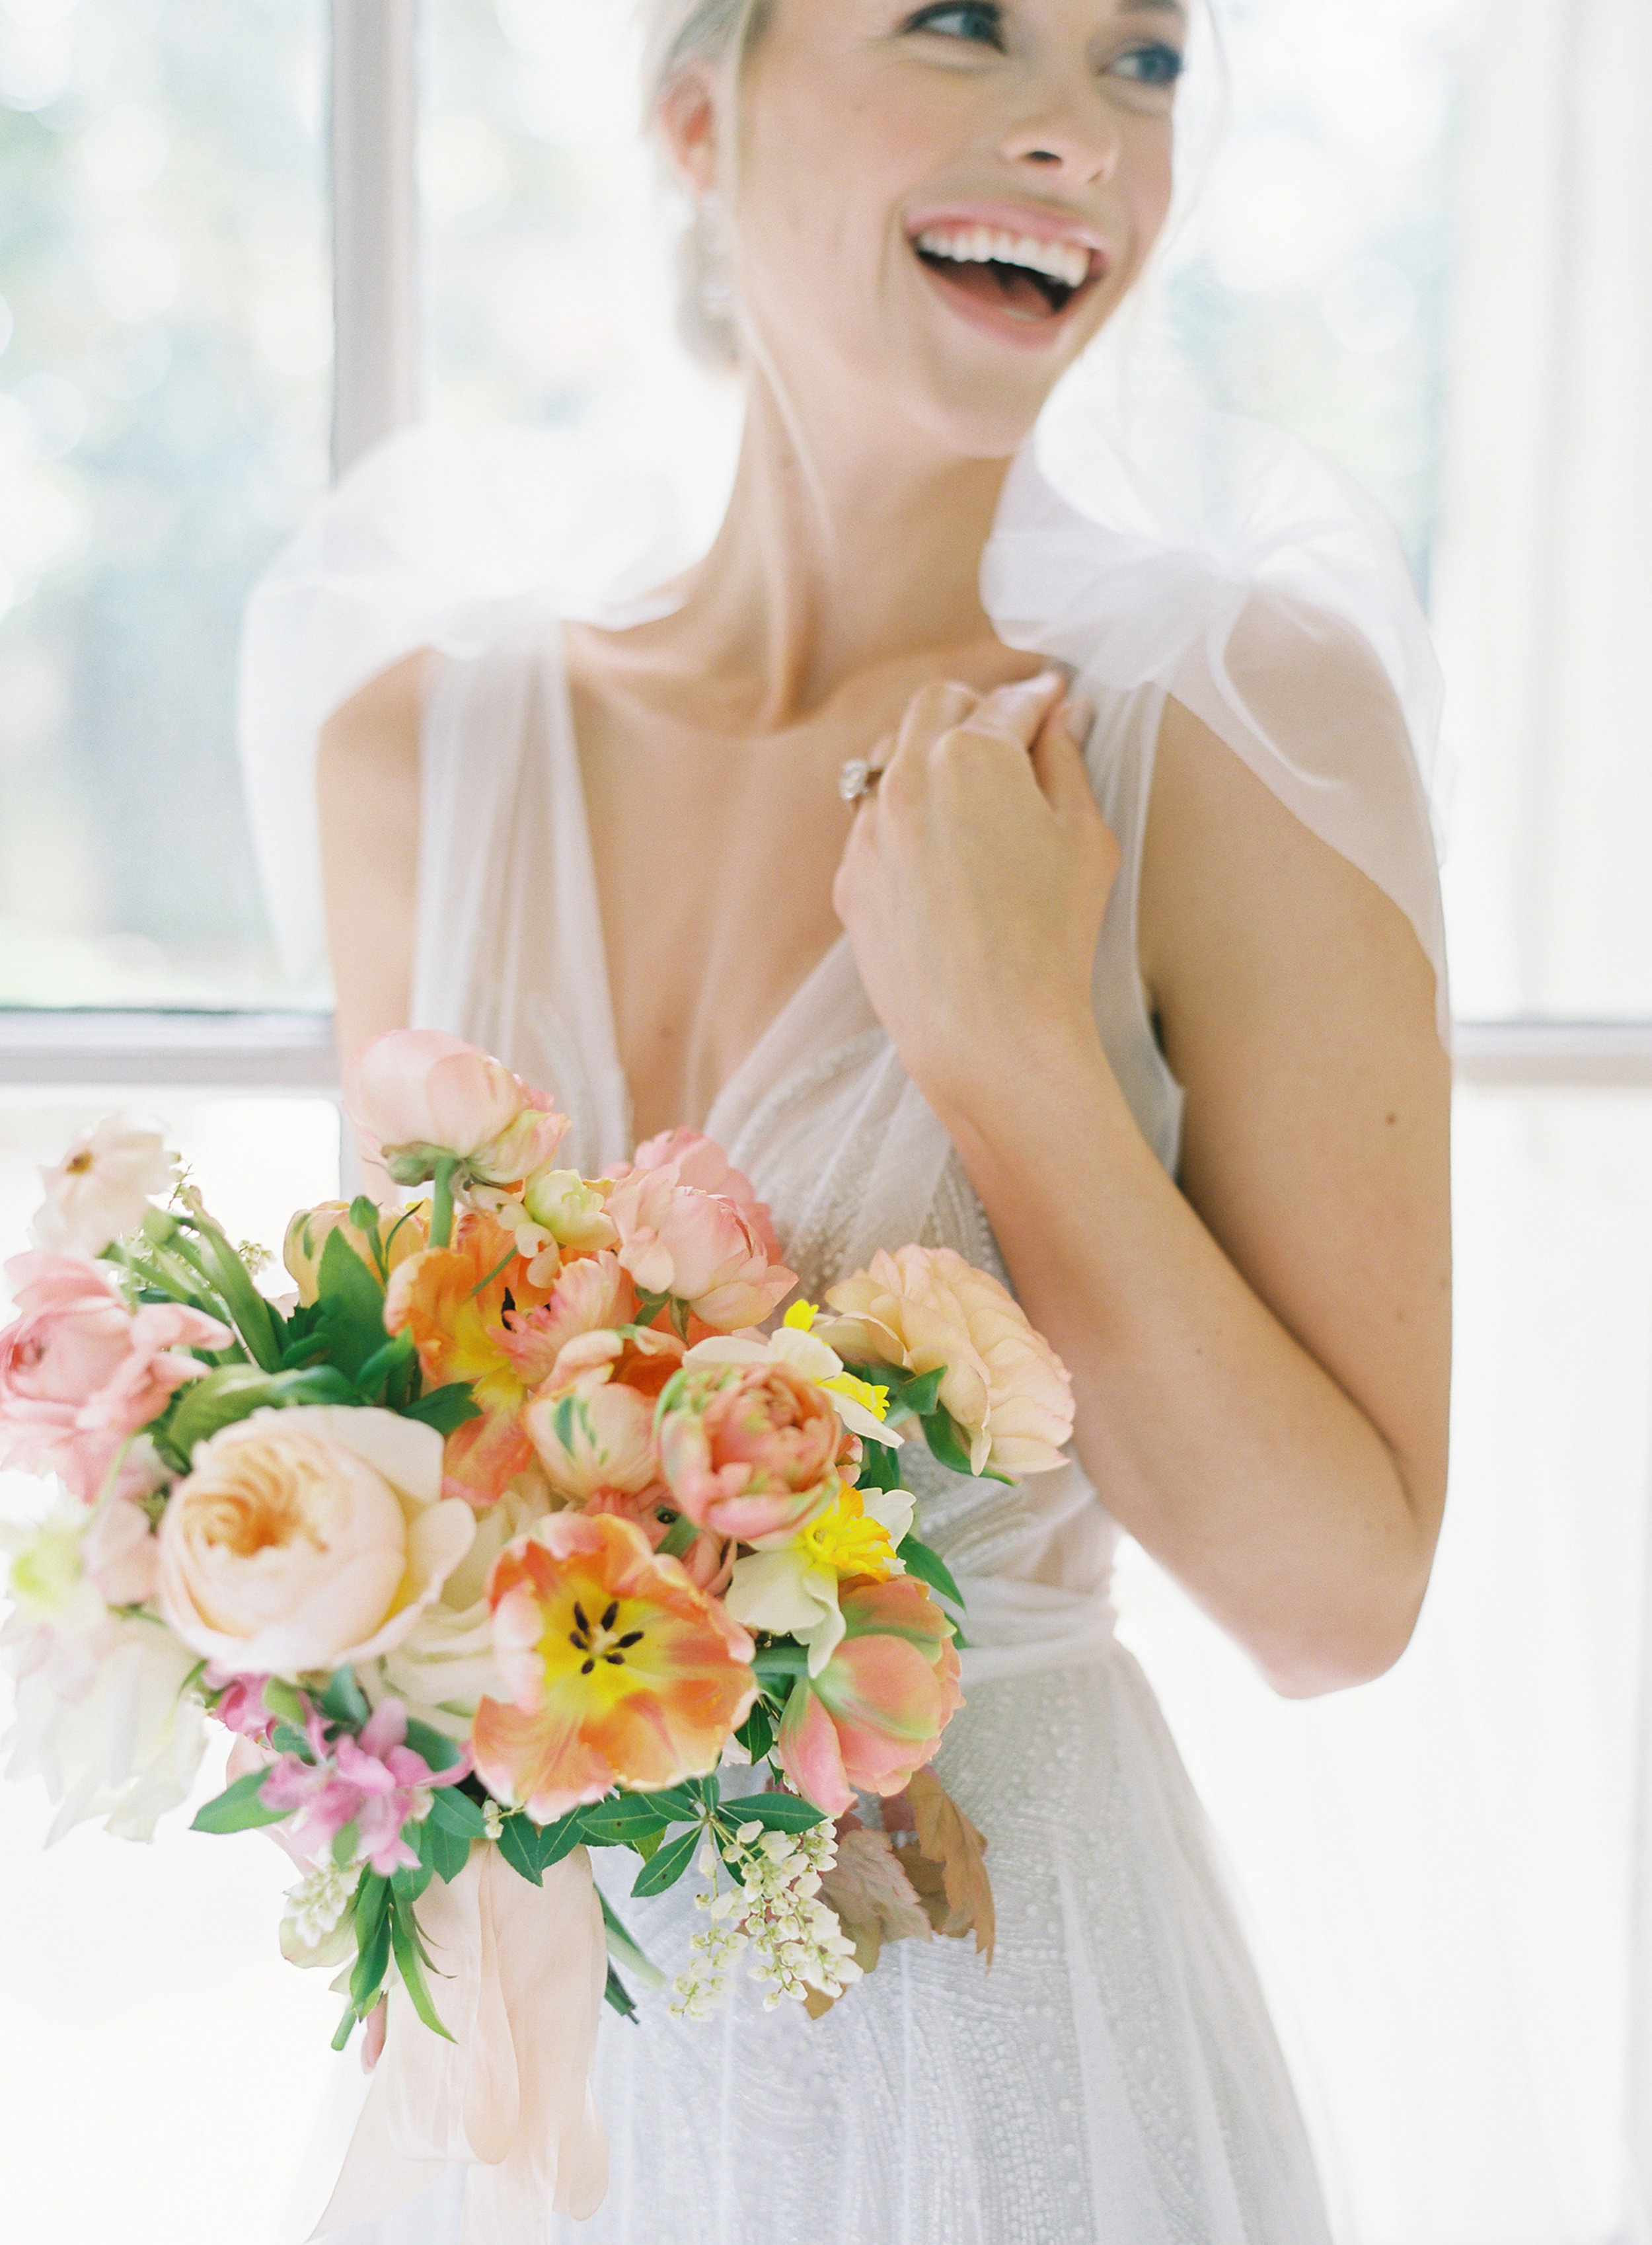 Sophie Felts Floral Design   DC Wedding Florist   DC Florist -55.jpg